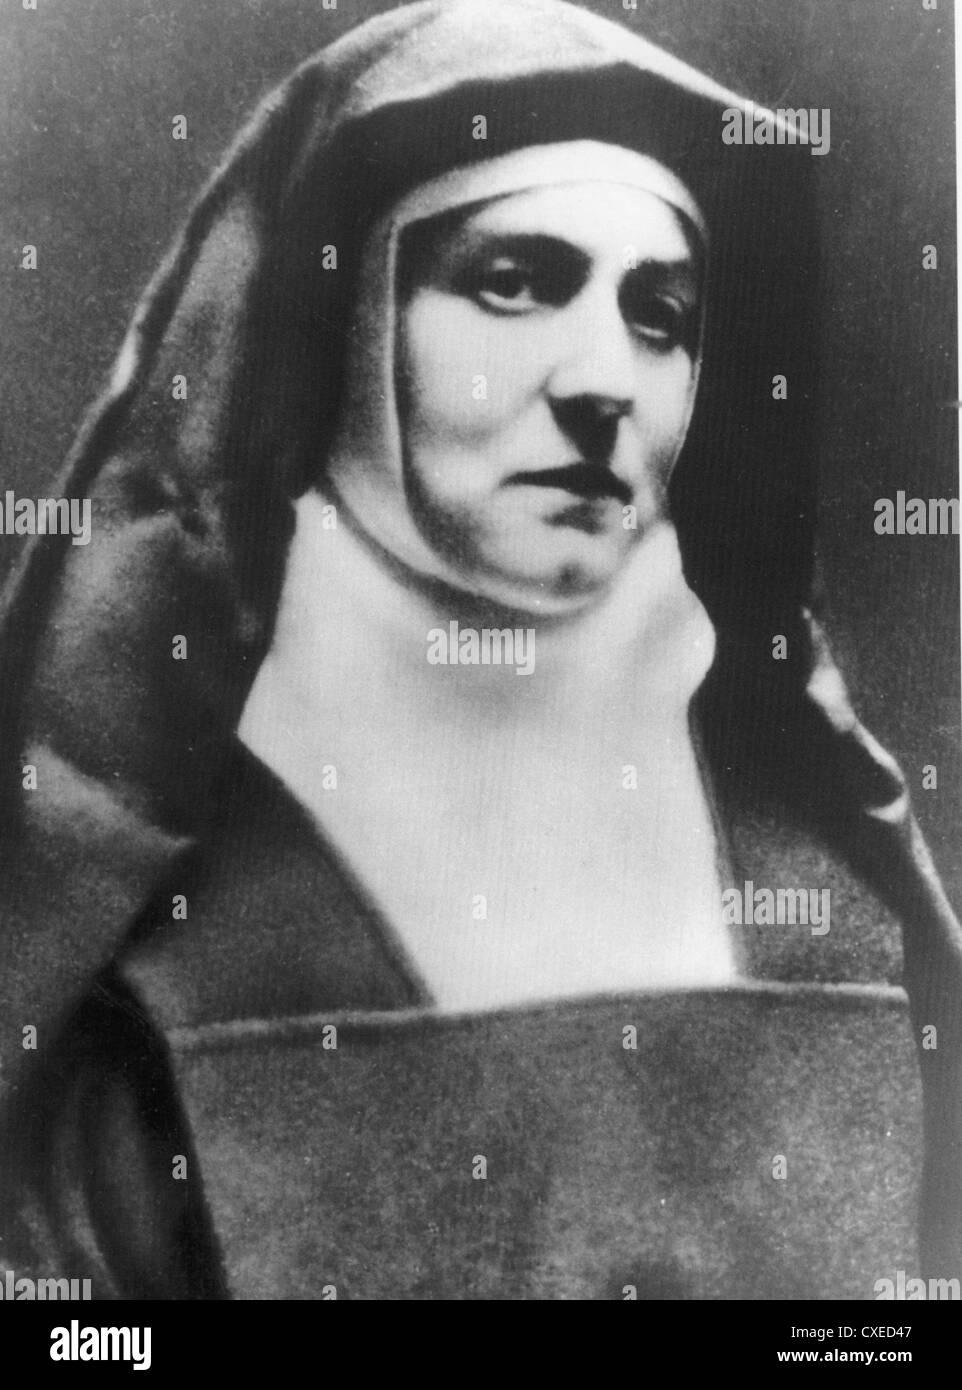 EDITH STEIN aka Saint Teresia Benedicta of the Cross (1891-1942) German Roman Catholic philosopher and martyr - Stock Image